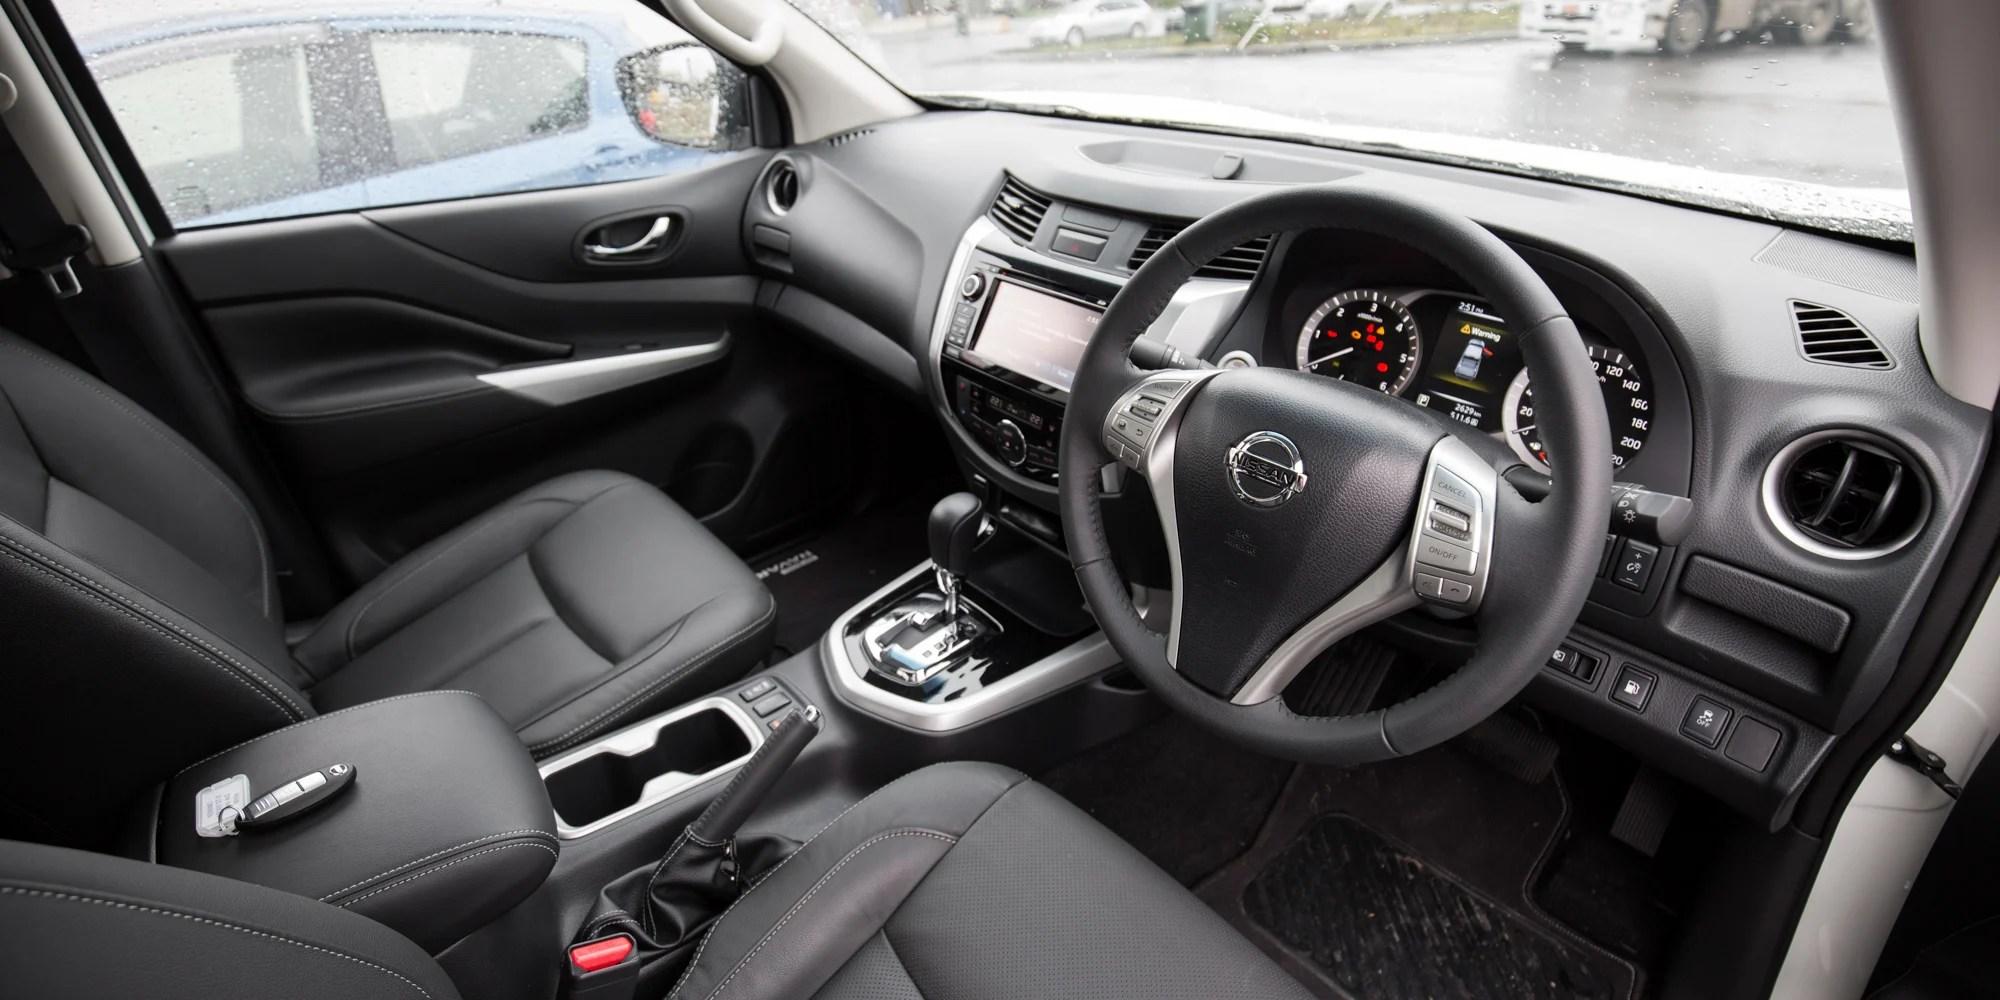 2015 Nissan Navara NP300 Review ST X 4x2 Dual Cab